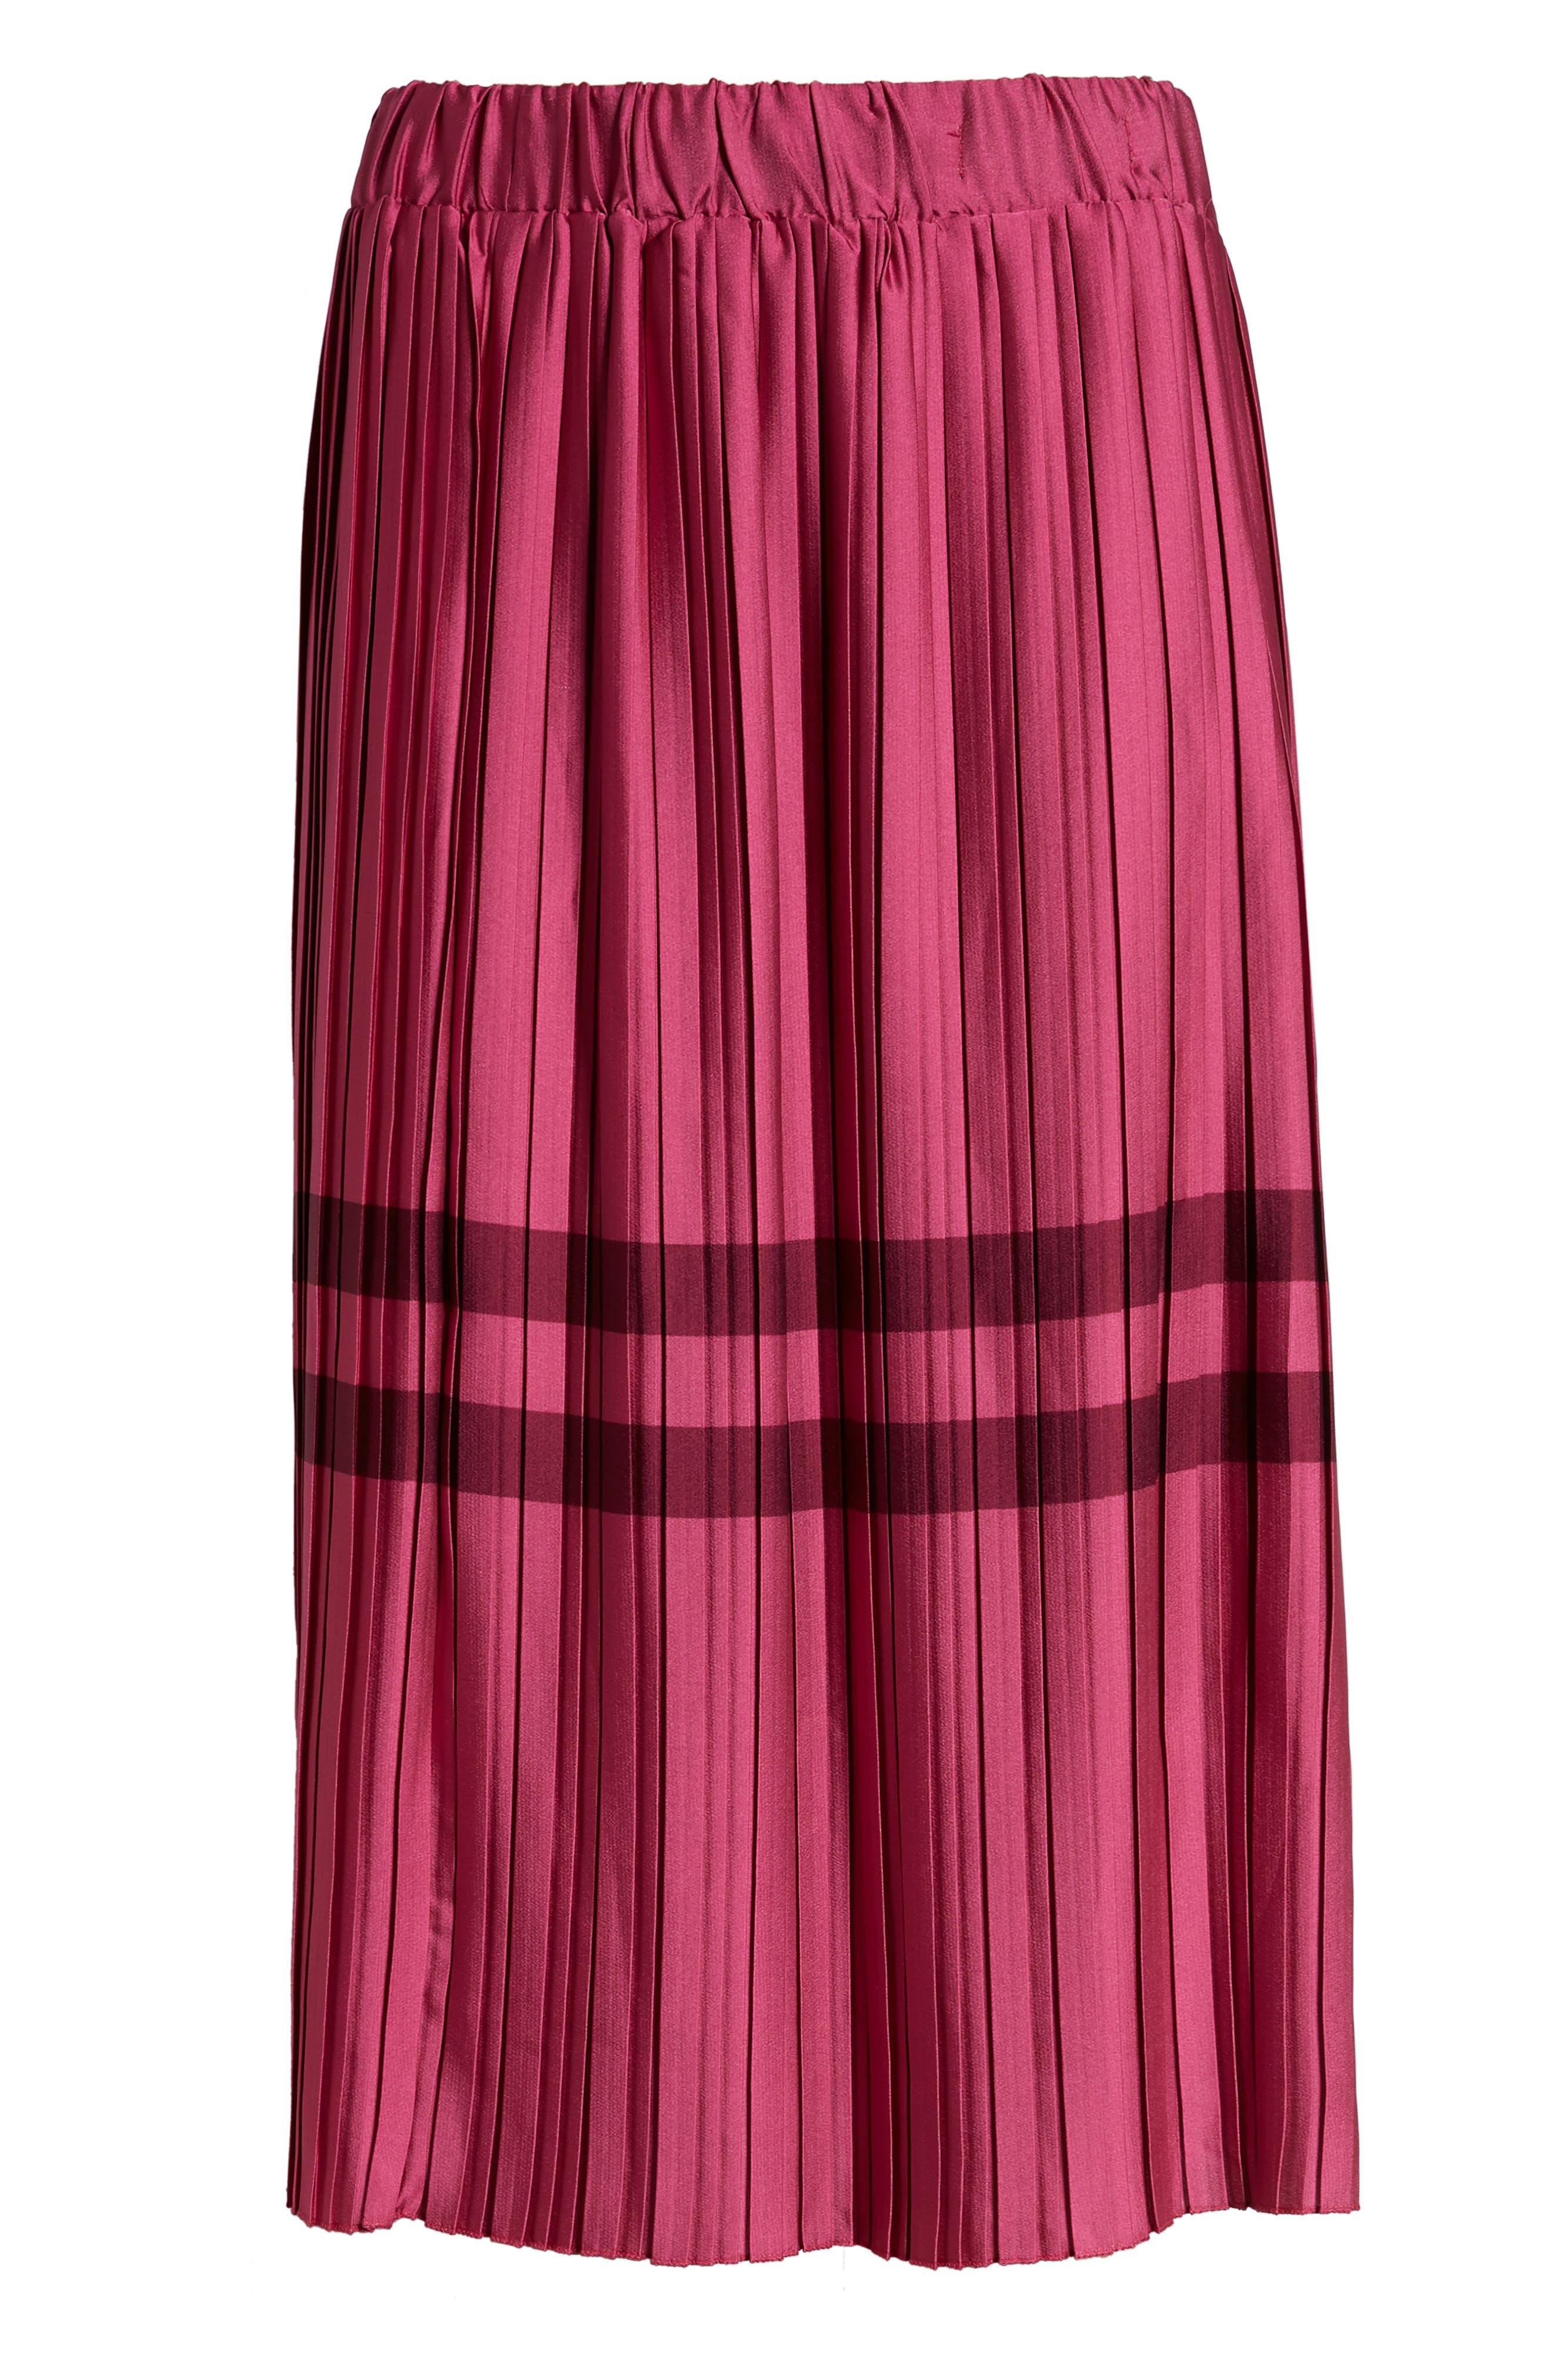 Niti Pleated Skirt,                             Alternate thumbnail 6, color,                             FESTIVAL FUCHSIA